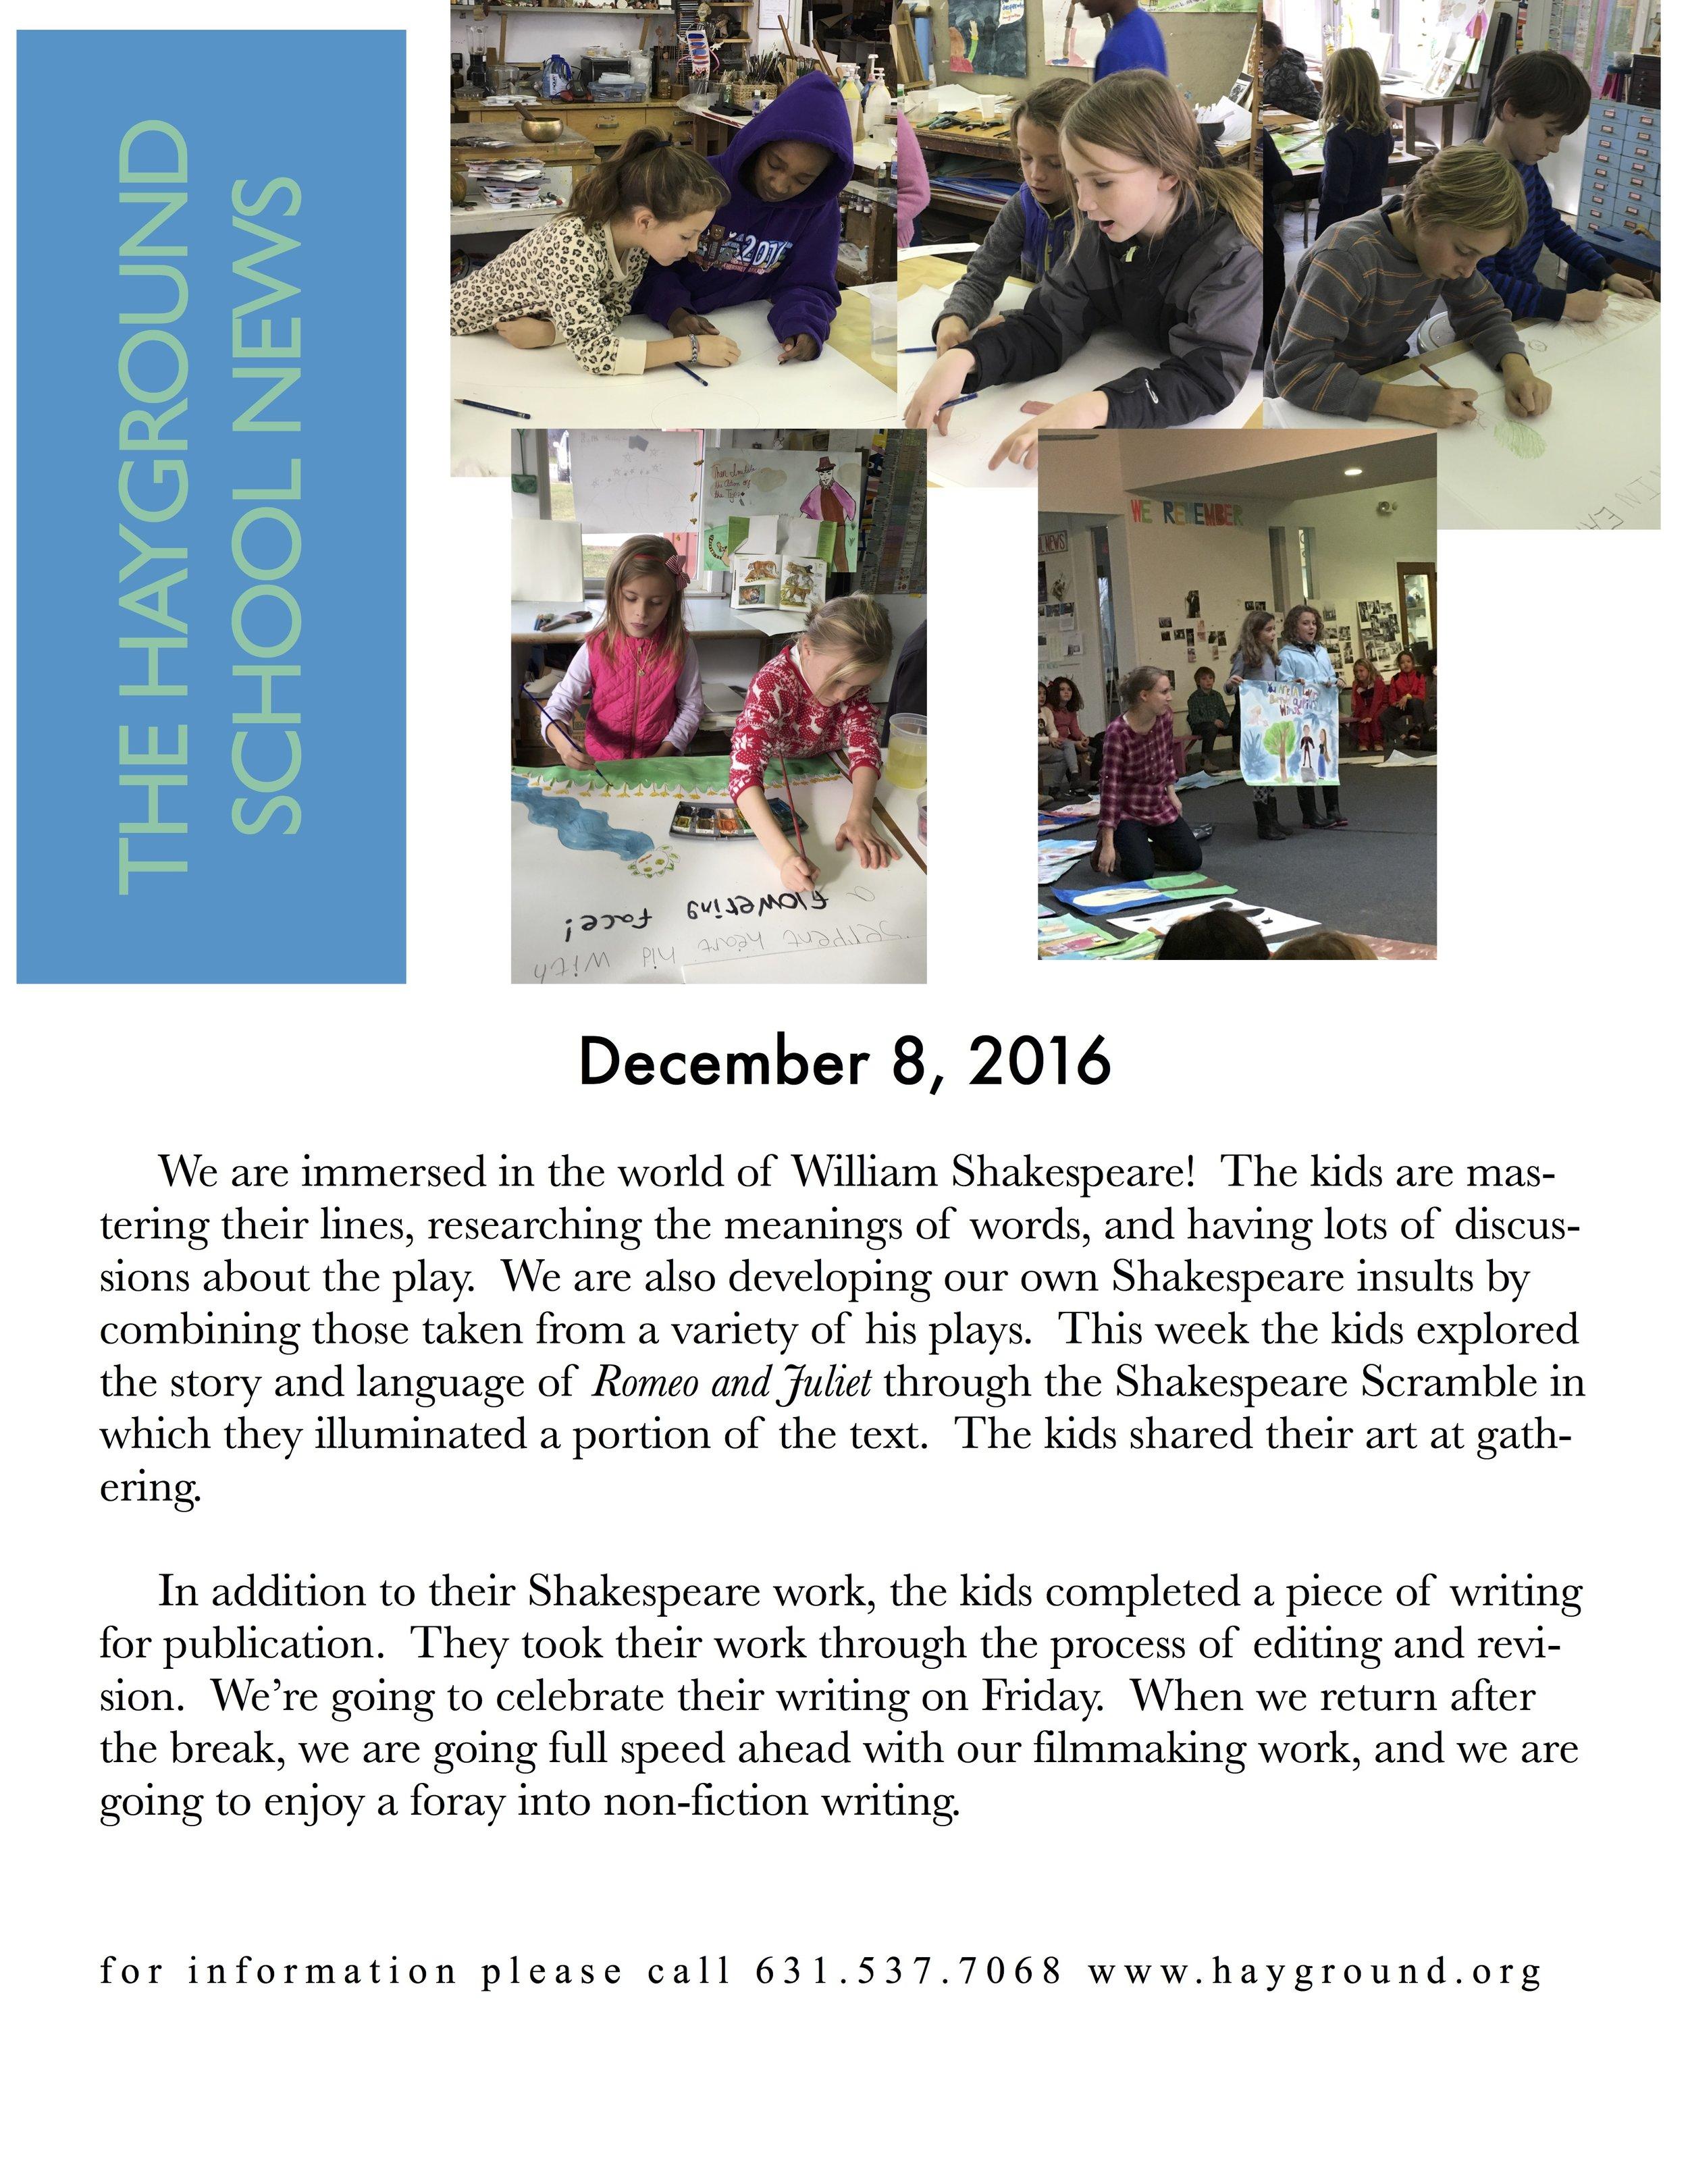 December 8 2016 classnotes copy.jpg